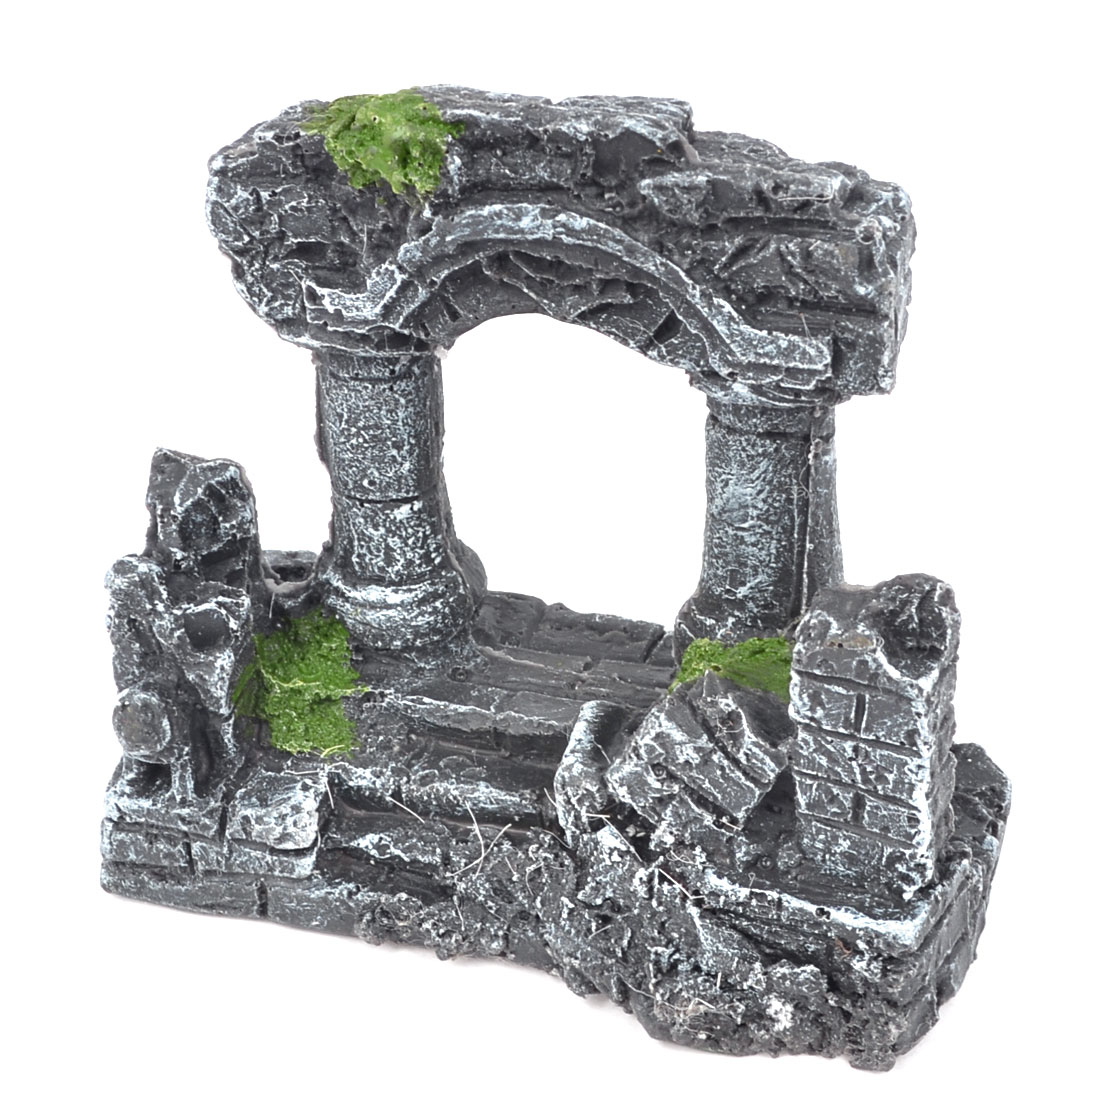 Fish Tank Landscaping Ornament Underwater Resin Building Design Dark Gray